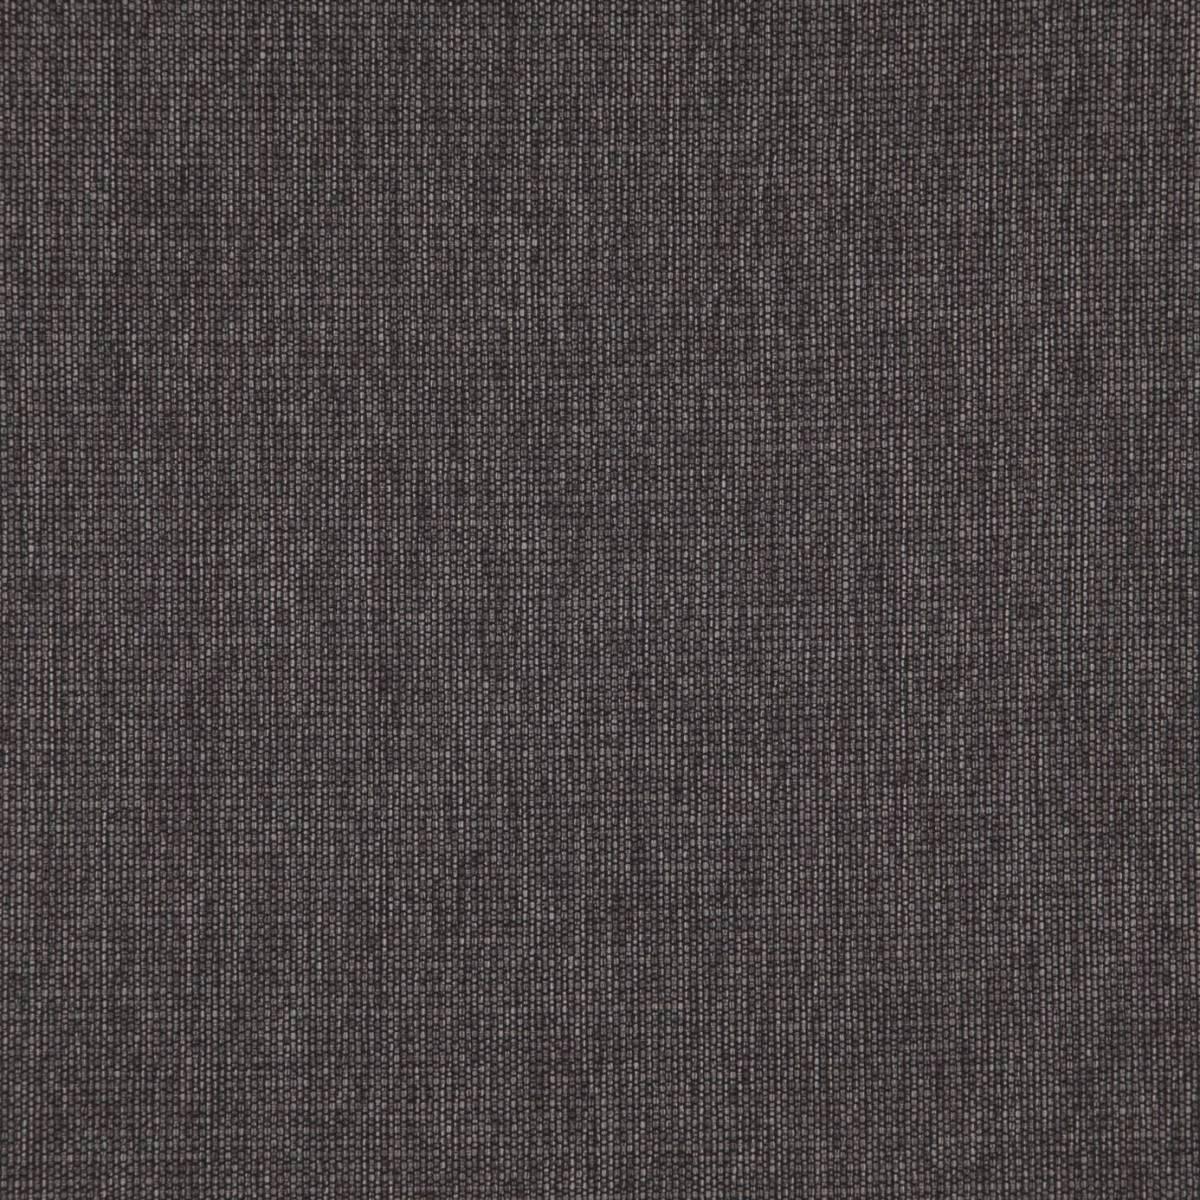 Penzance Fabric Peat 7198927 Prestigious Textiles Penzance